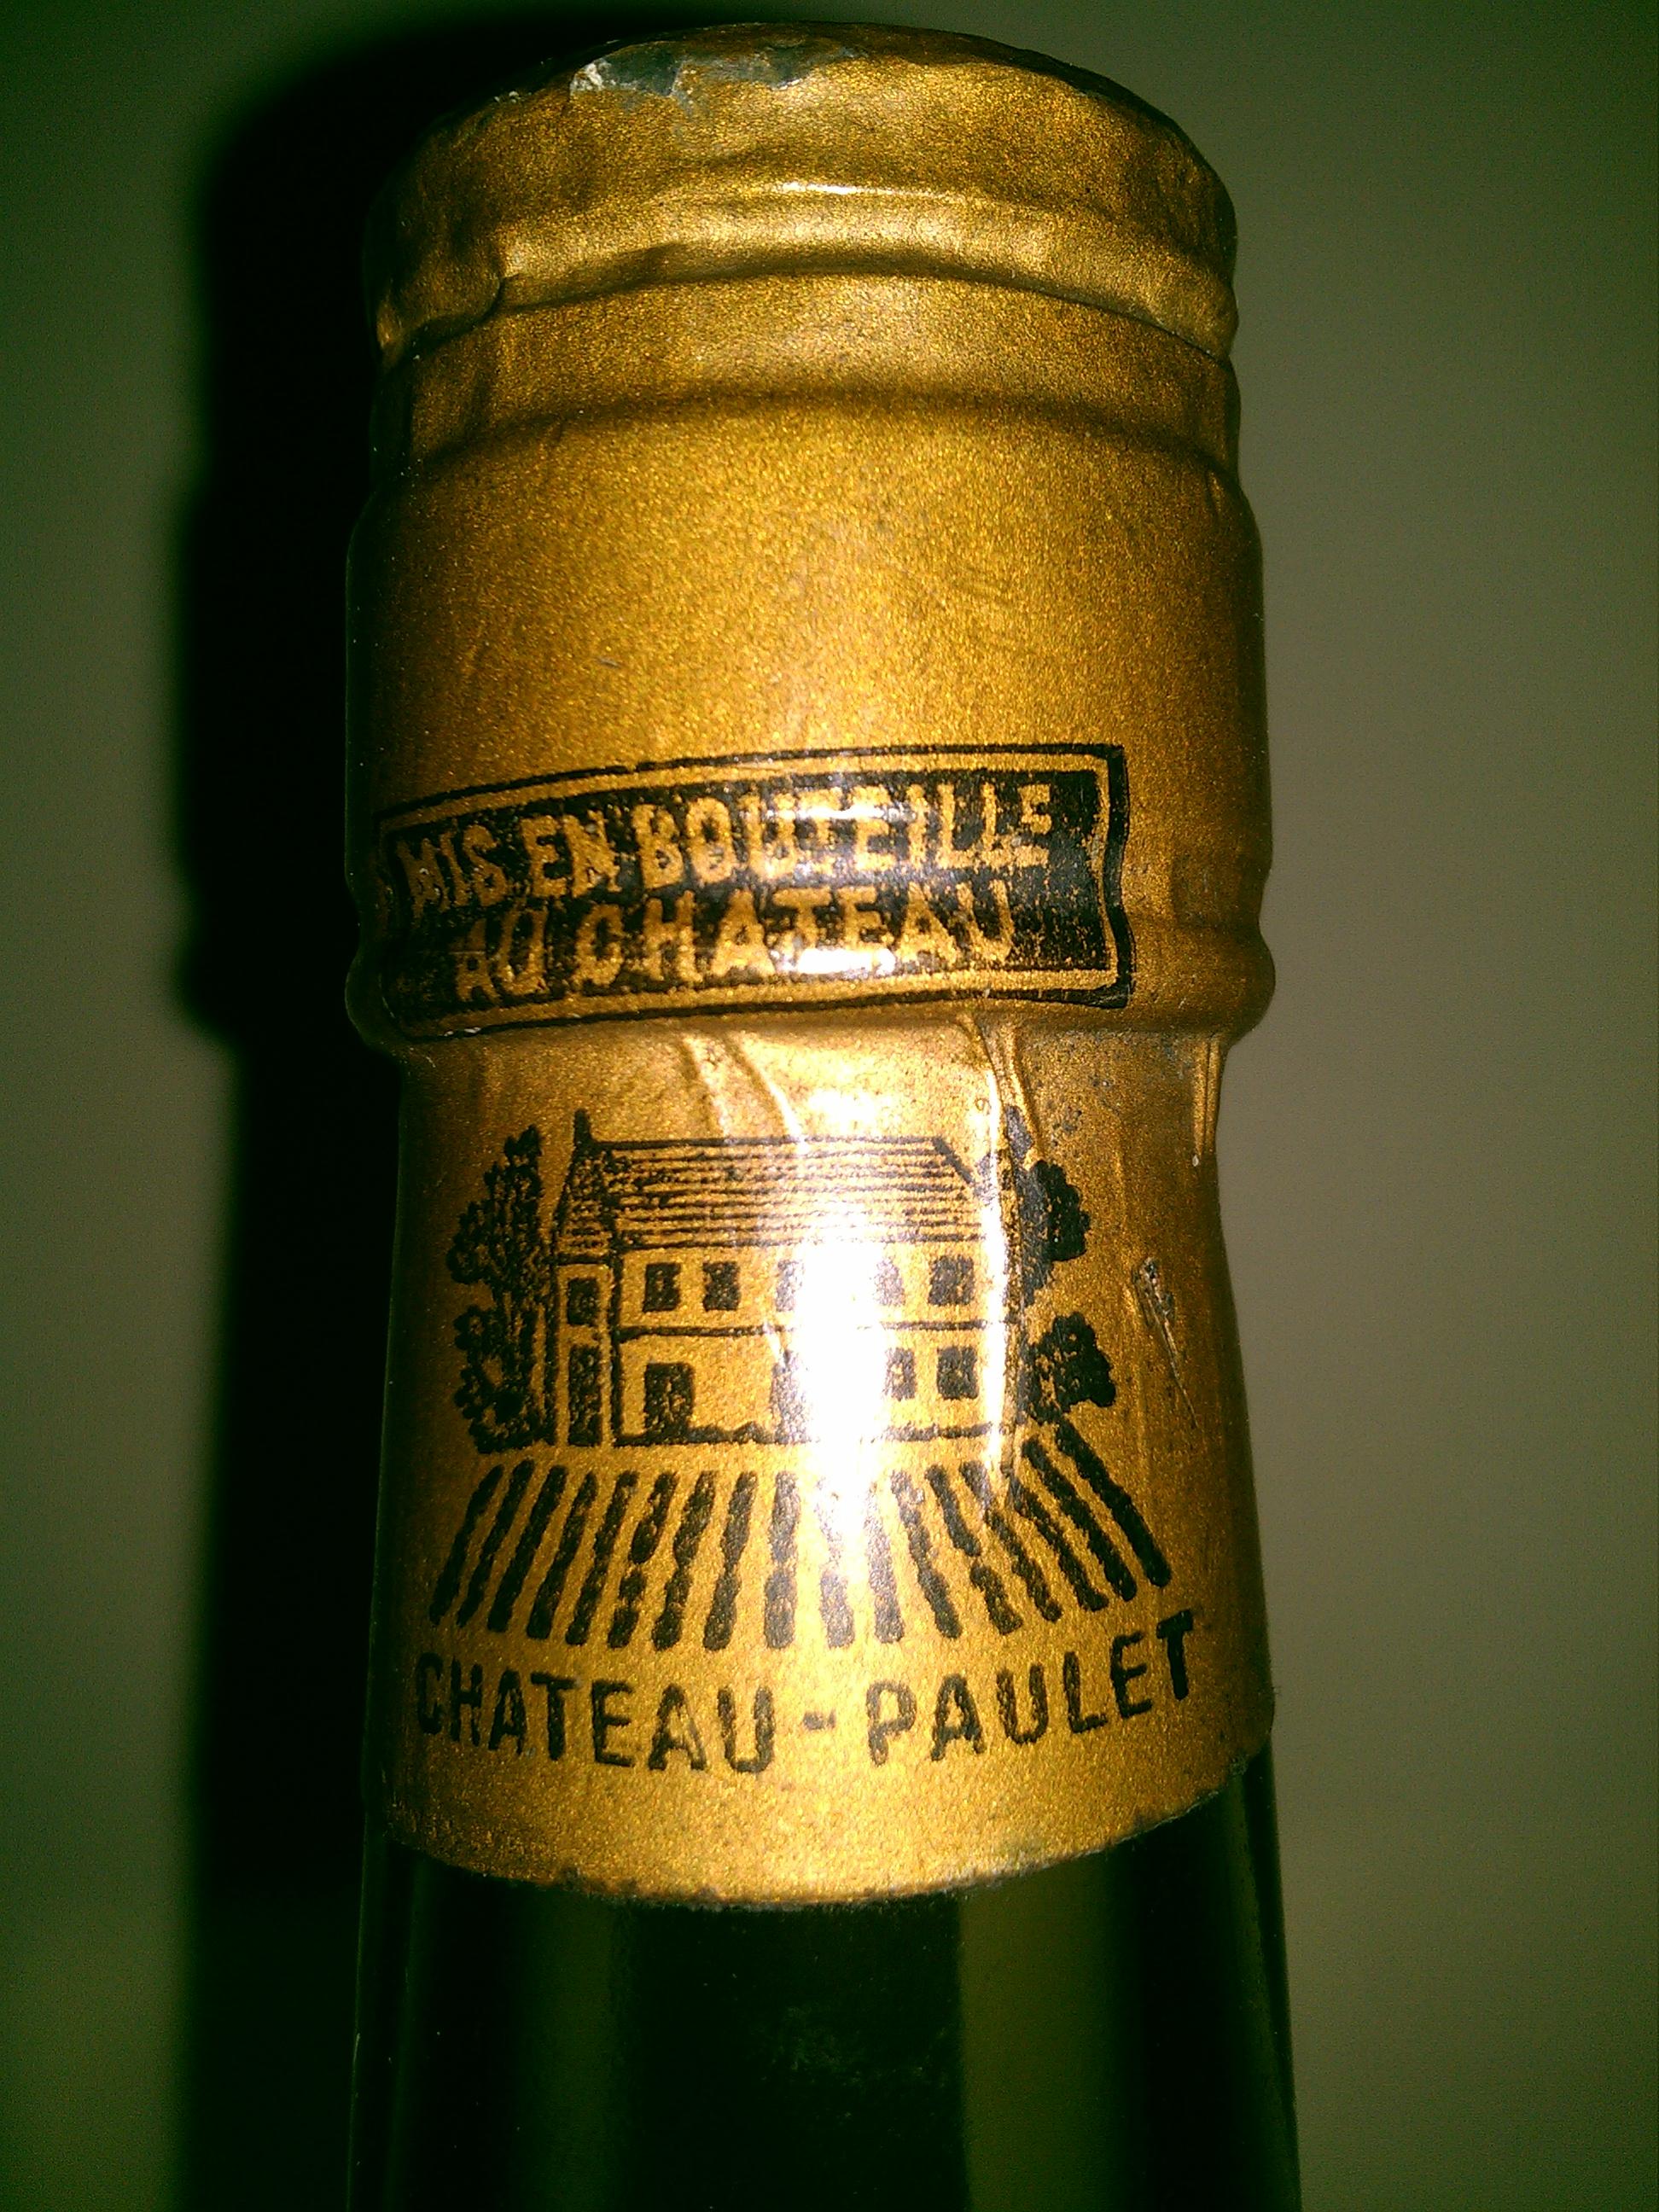 Chateau Paulet Grande Fine Champagne Napoleon Extra